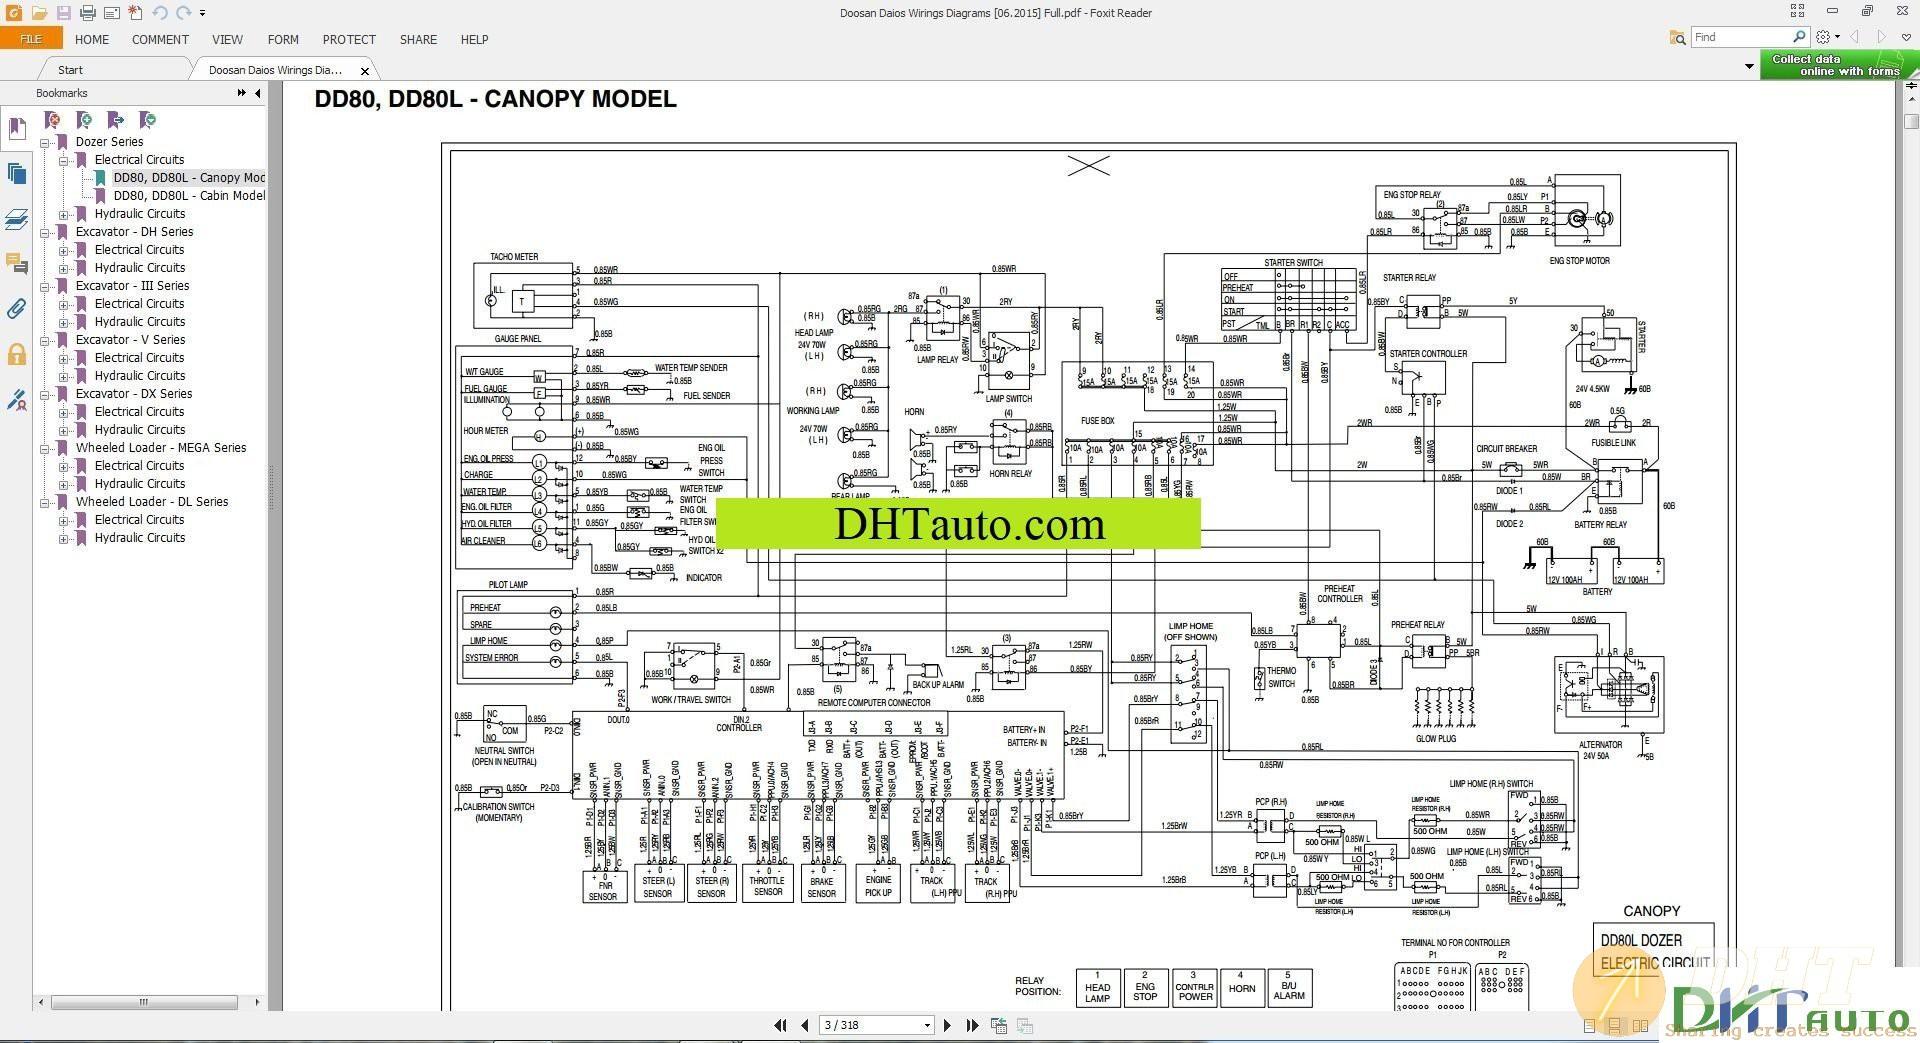 Doosan-Daios-Wirings-Diagrams-Full-06.2015-2.jpg